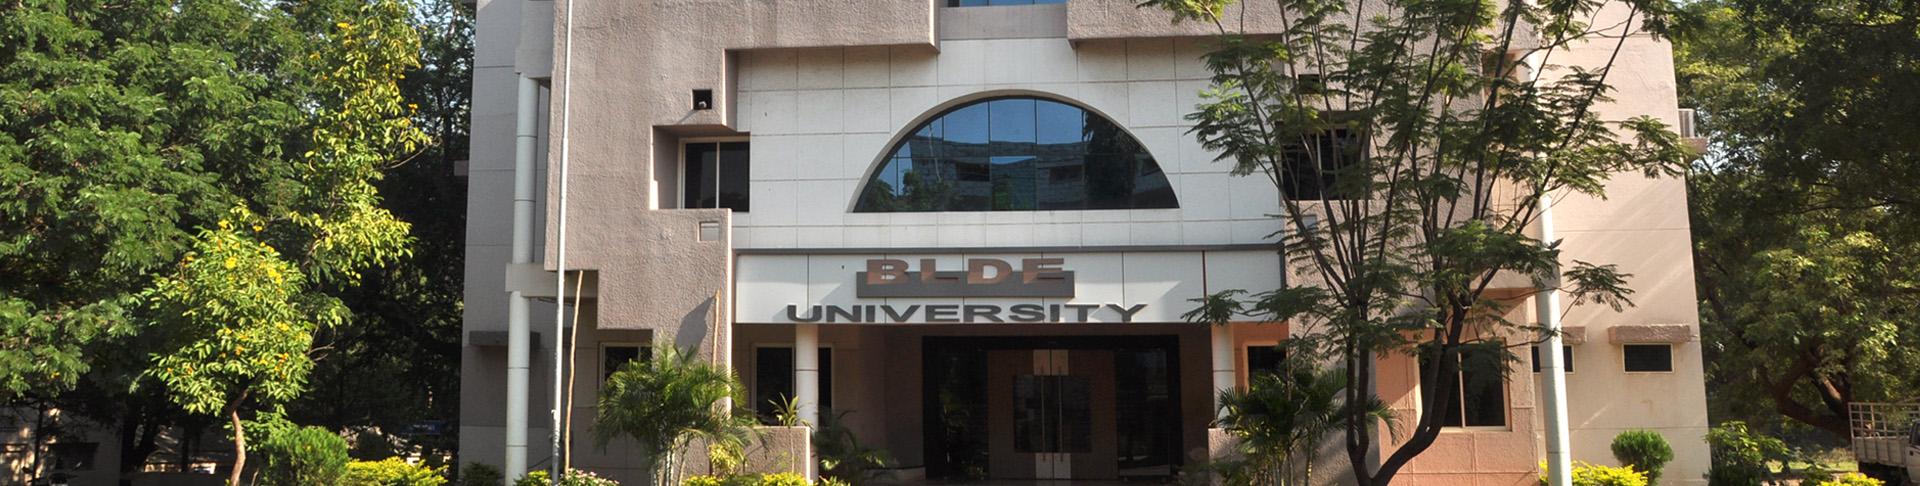 B.L.D.E. University, Vijayapura